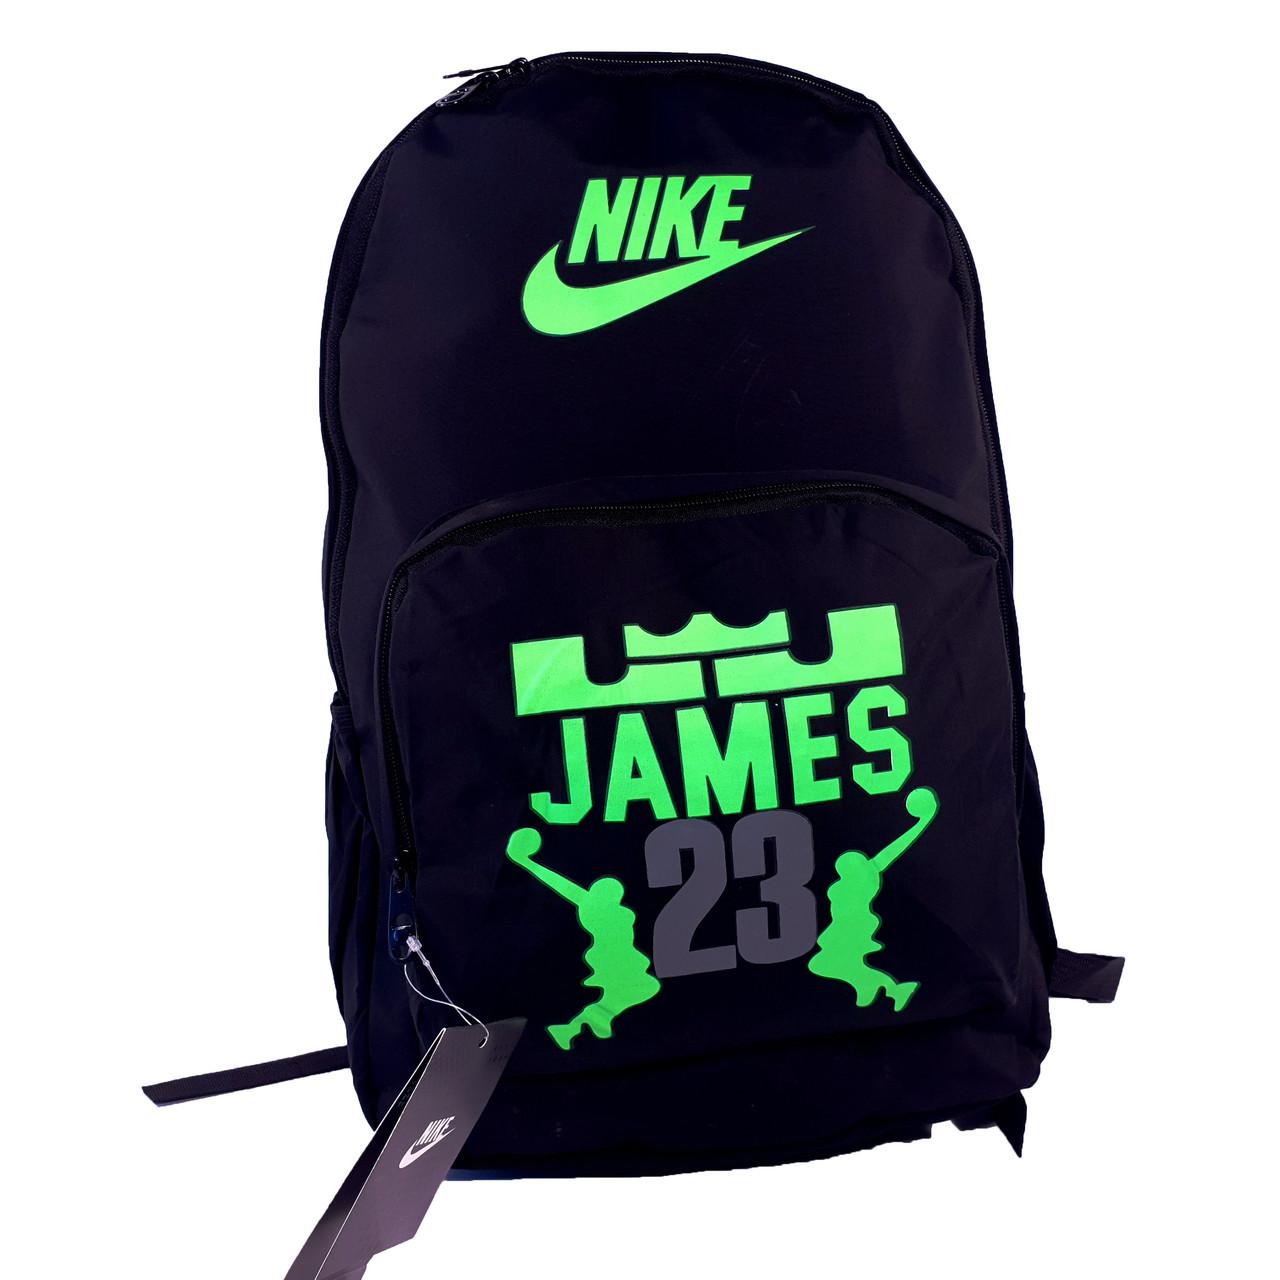 Спортивный рюкзак Nike,РАСПРОДАЖА